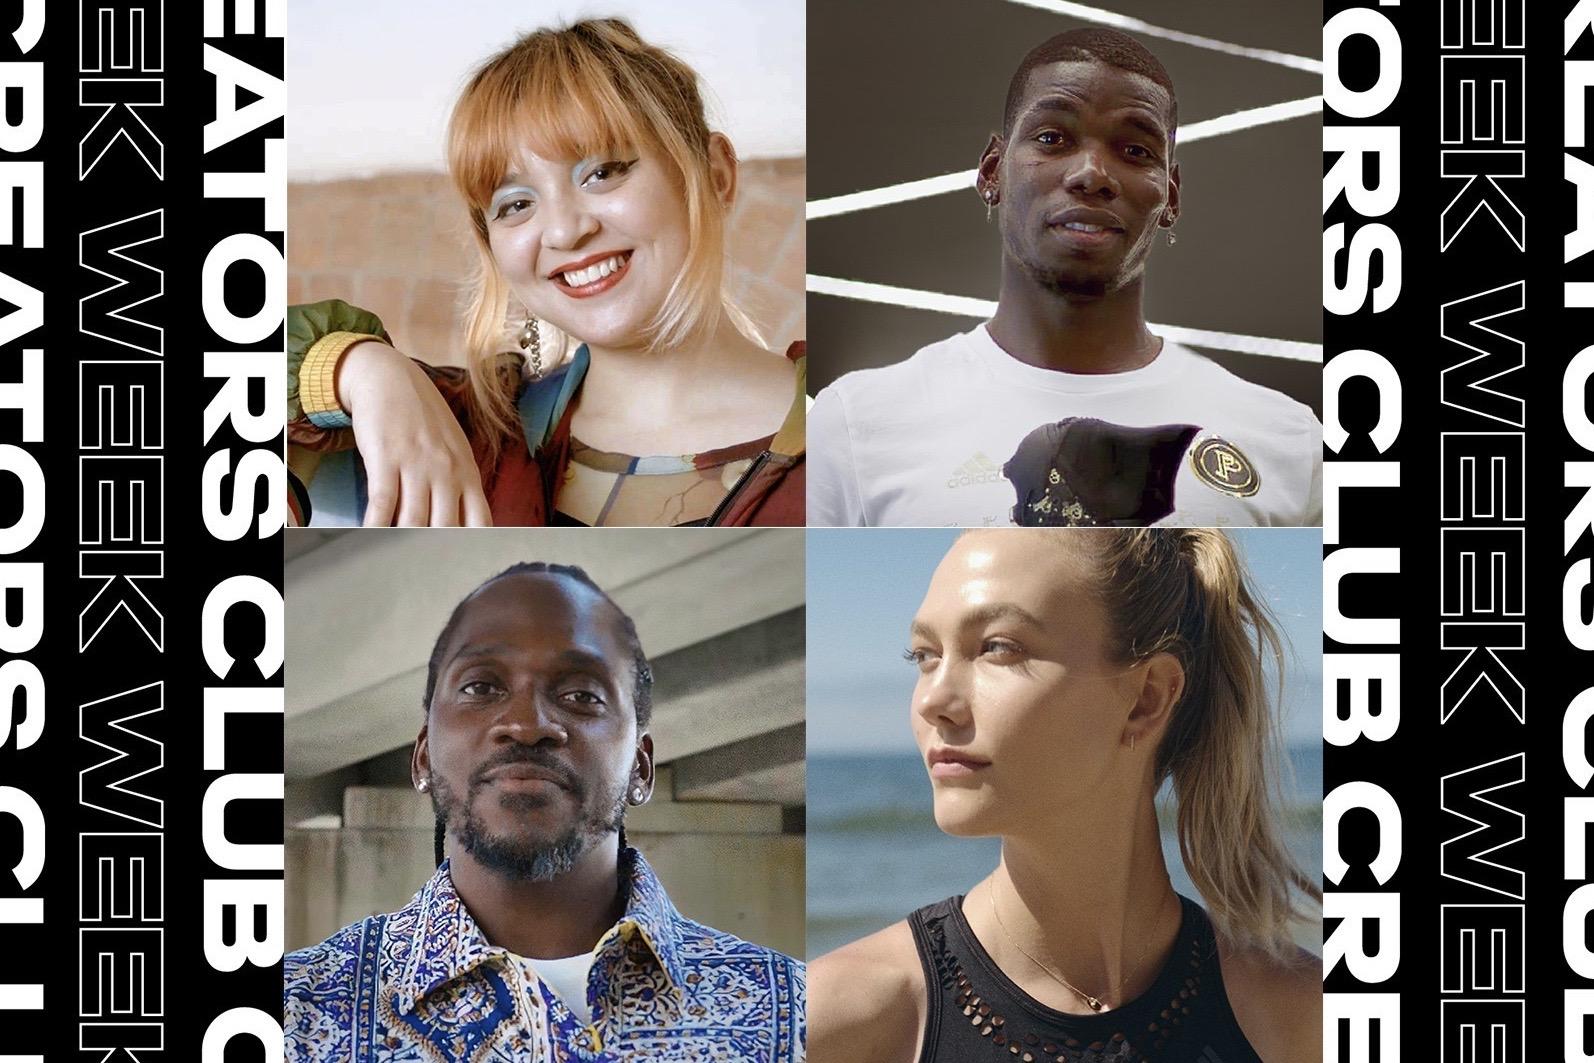 Adidas 举行为期7天数字化宣传周:推出史上最大规模限量款 drop式上新